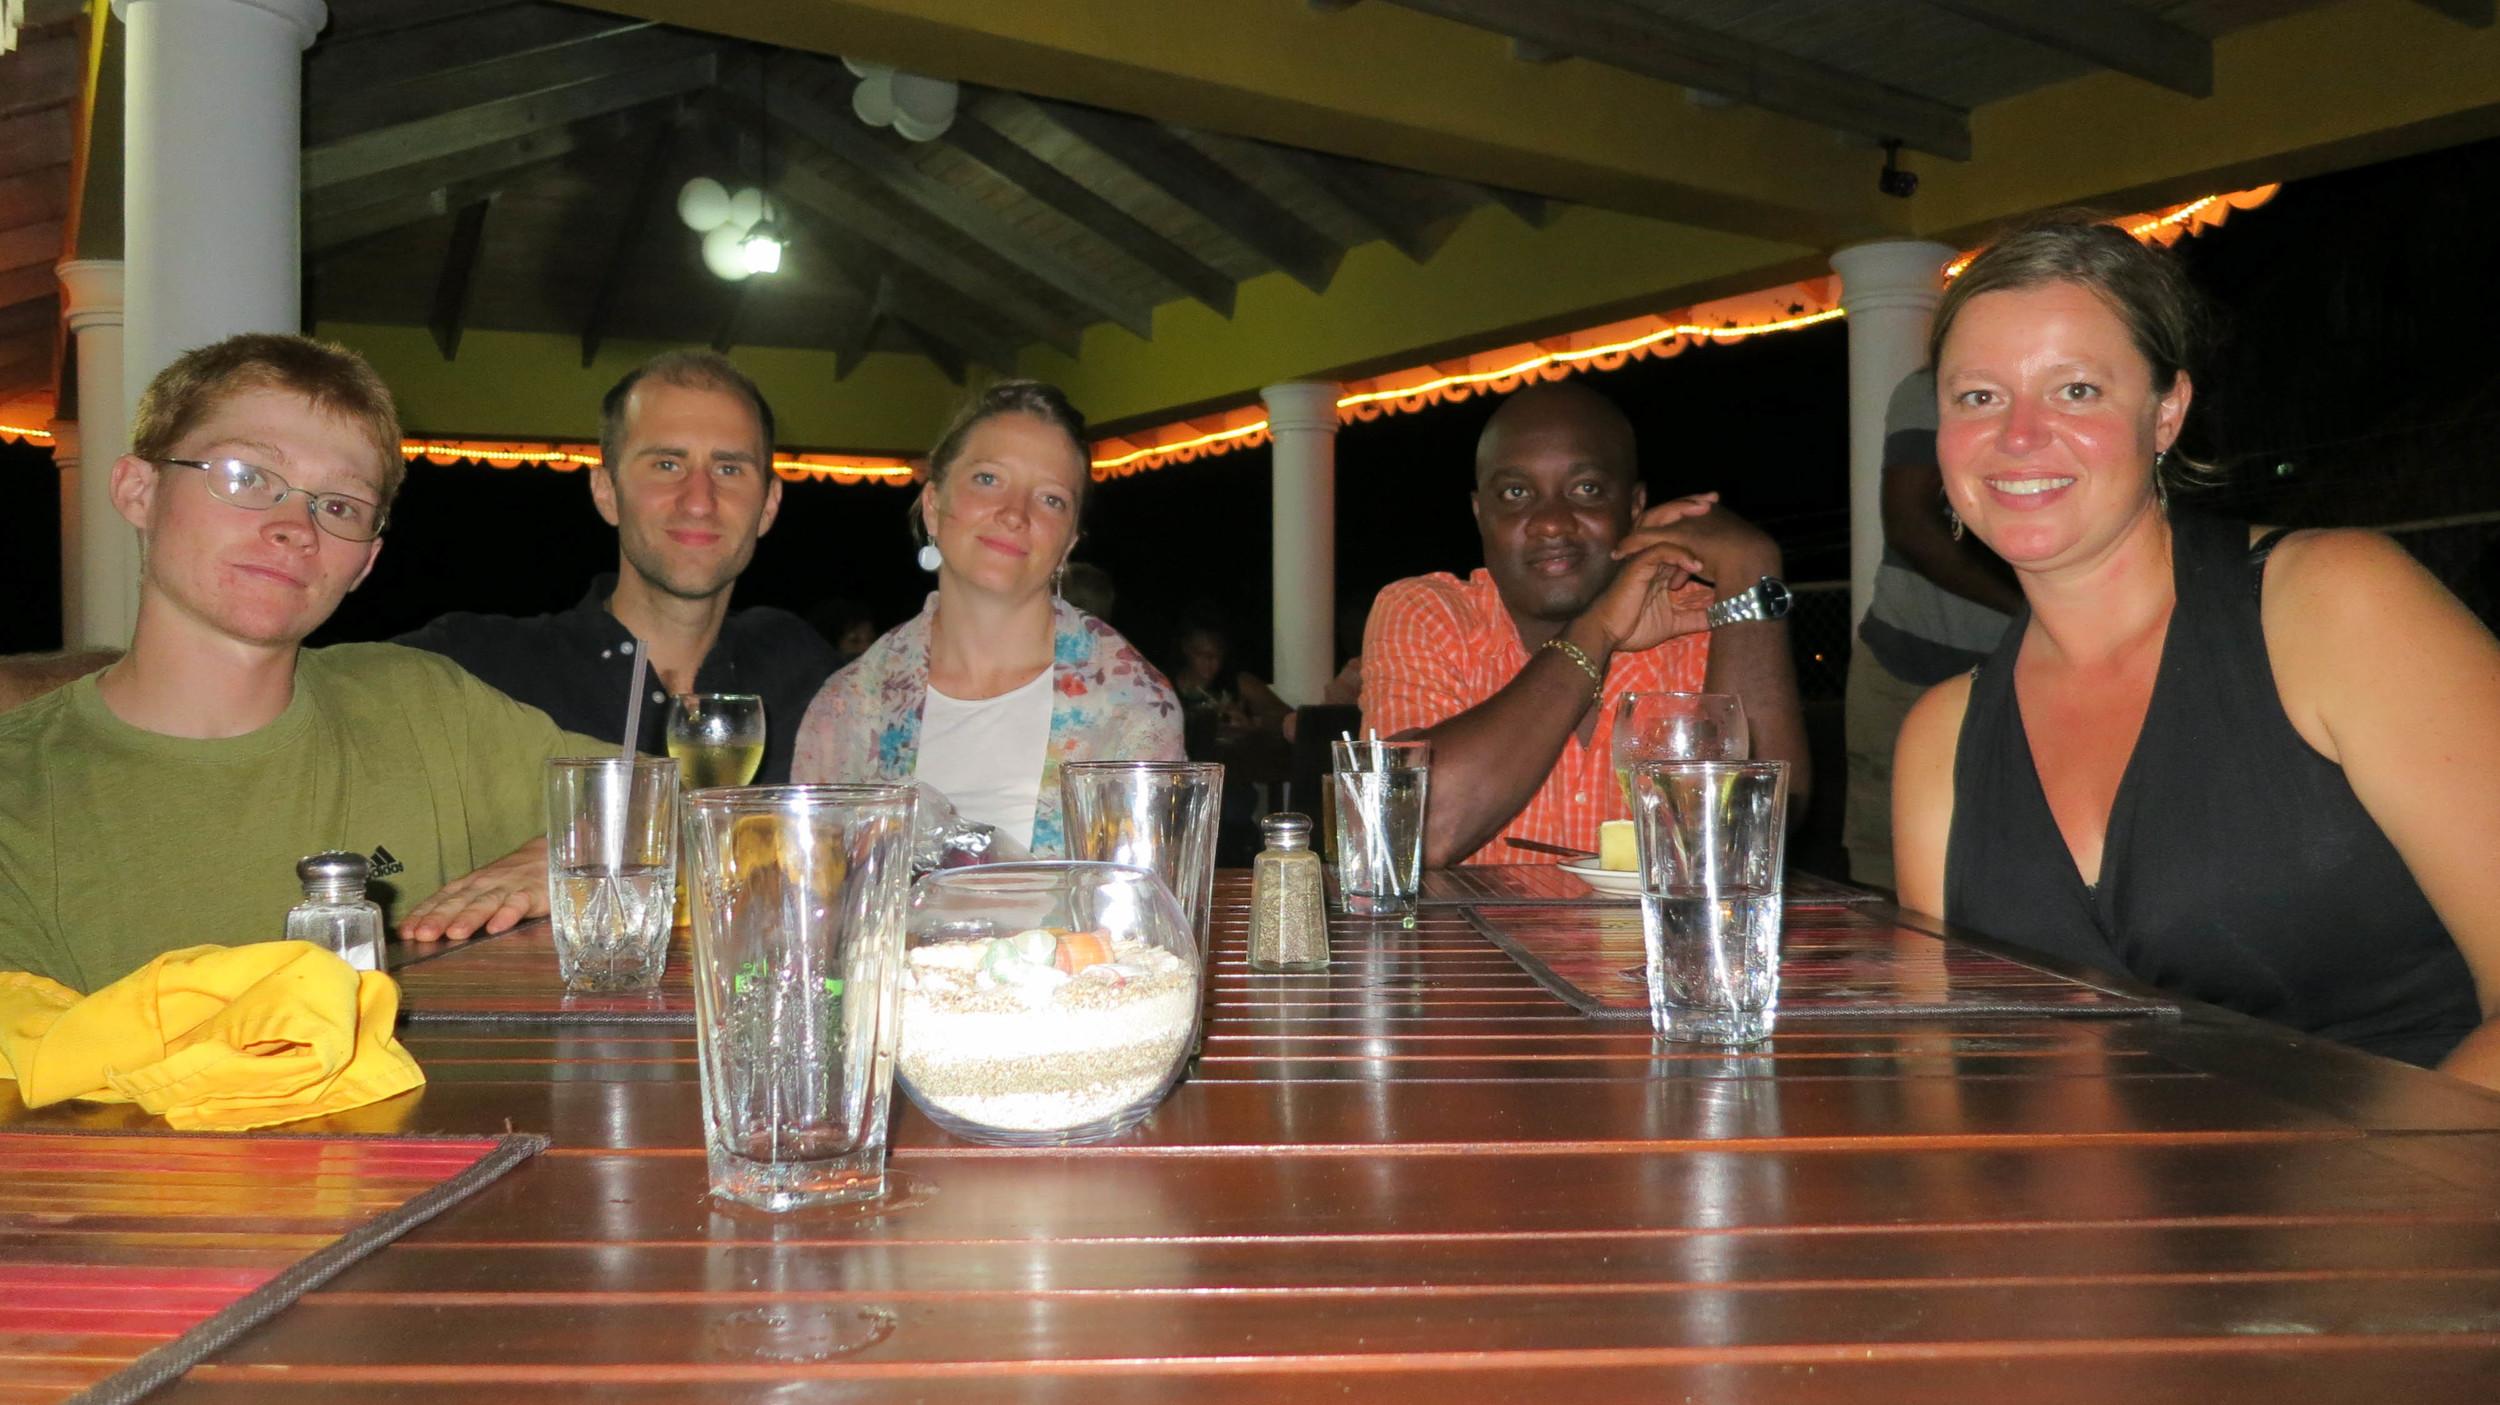 Shale Hunter, Tom Miller, Nuin-Tara Key, Marlin Nanyton, Annie Von Burg at Paradise Beach Hotel Friday BBQ